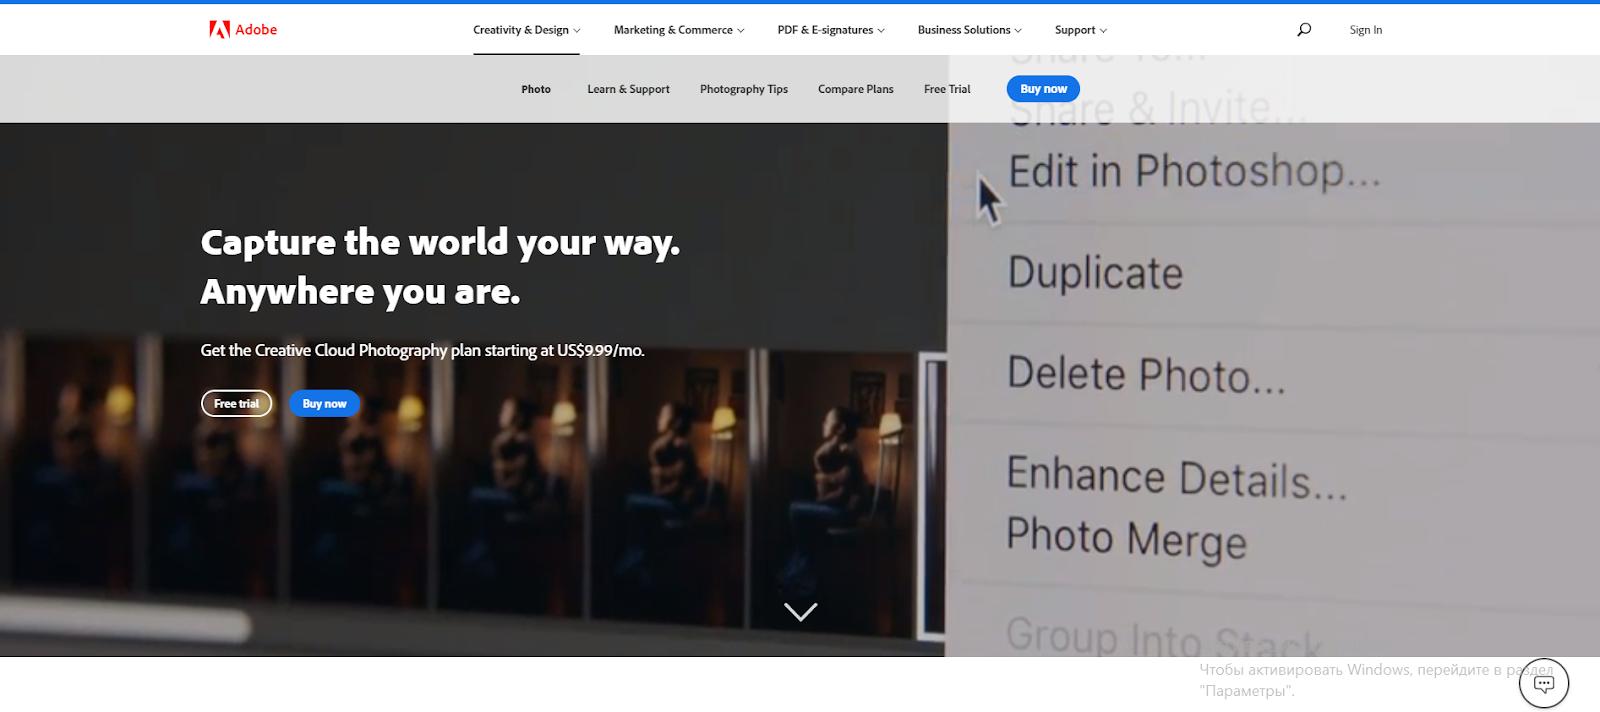 Adobe click-through landing page example